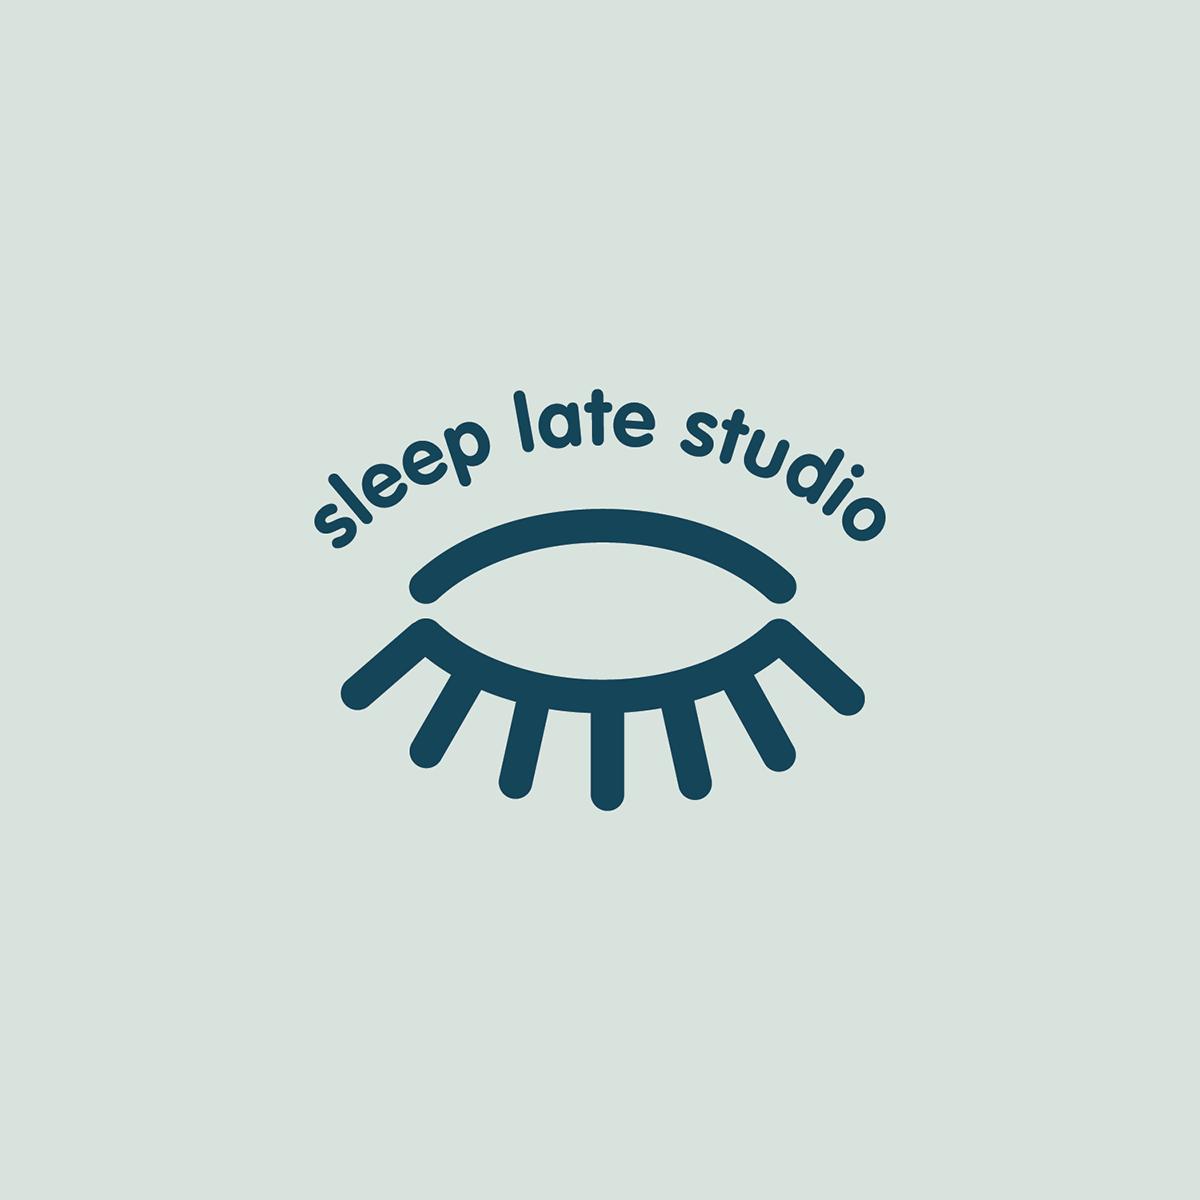 sleeplatestudio-logo-blue-02